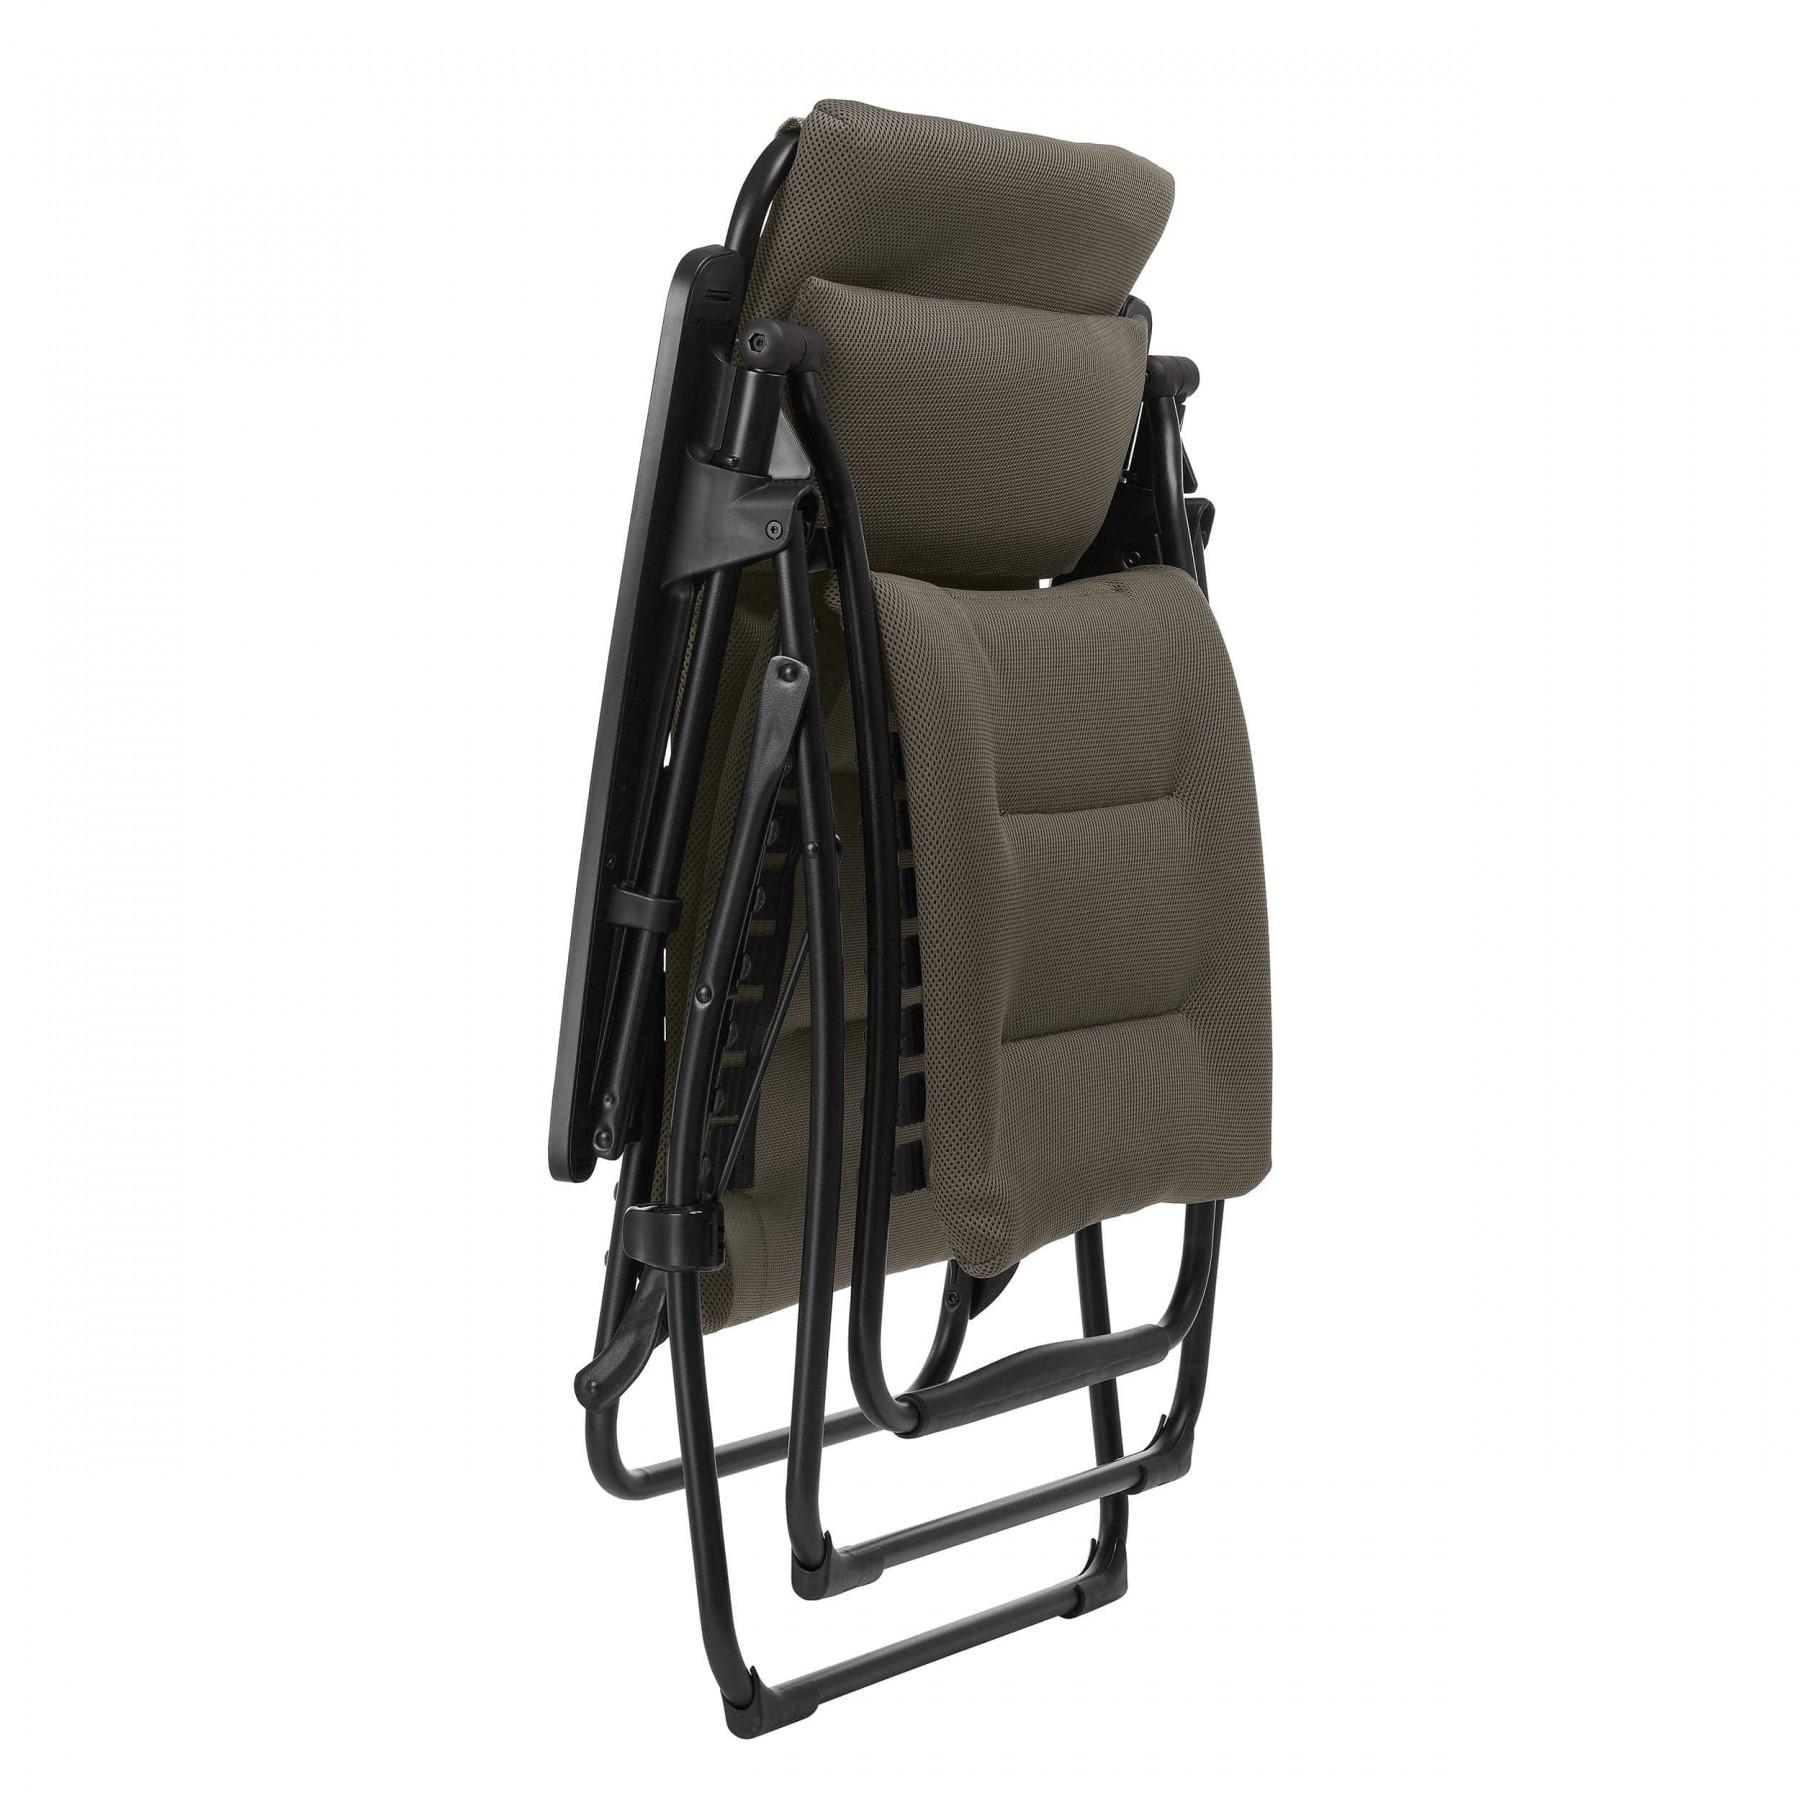 Fauteuil De Relaxation Futura Air Comfort Taupe | Lafuma ... tout Fauteuil Relax De Jardin Pas Cher